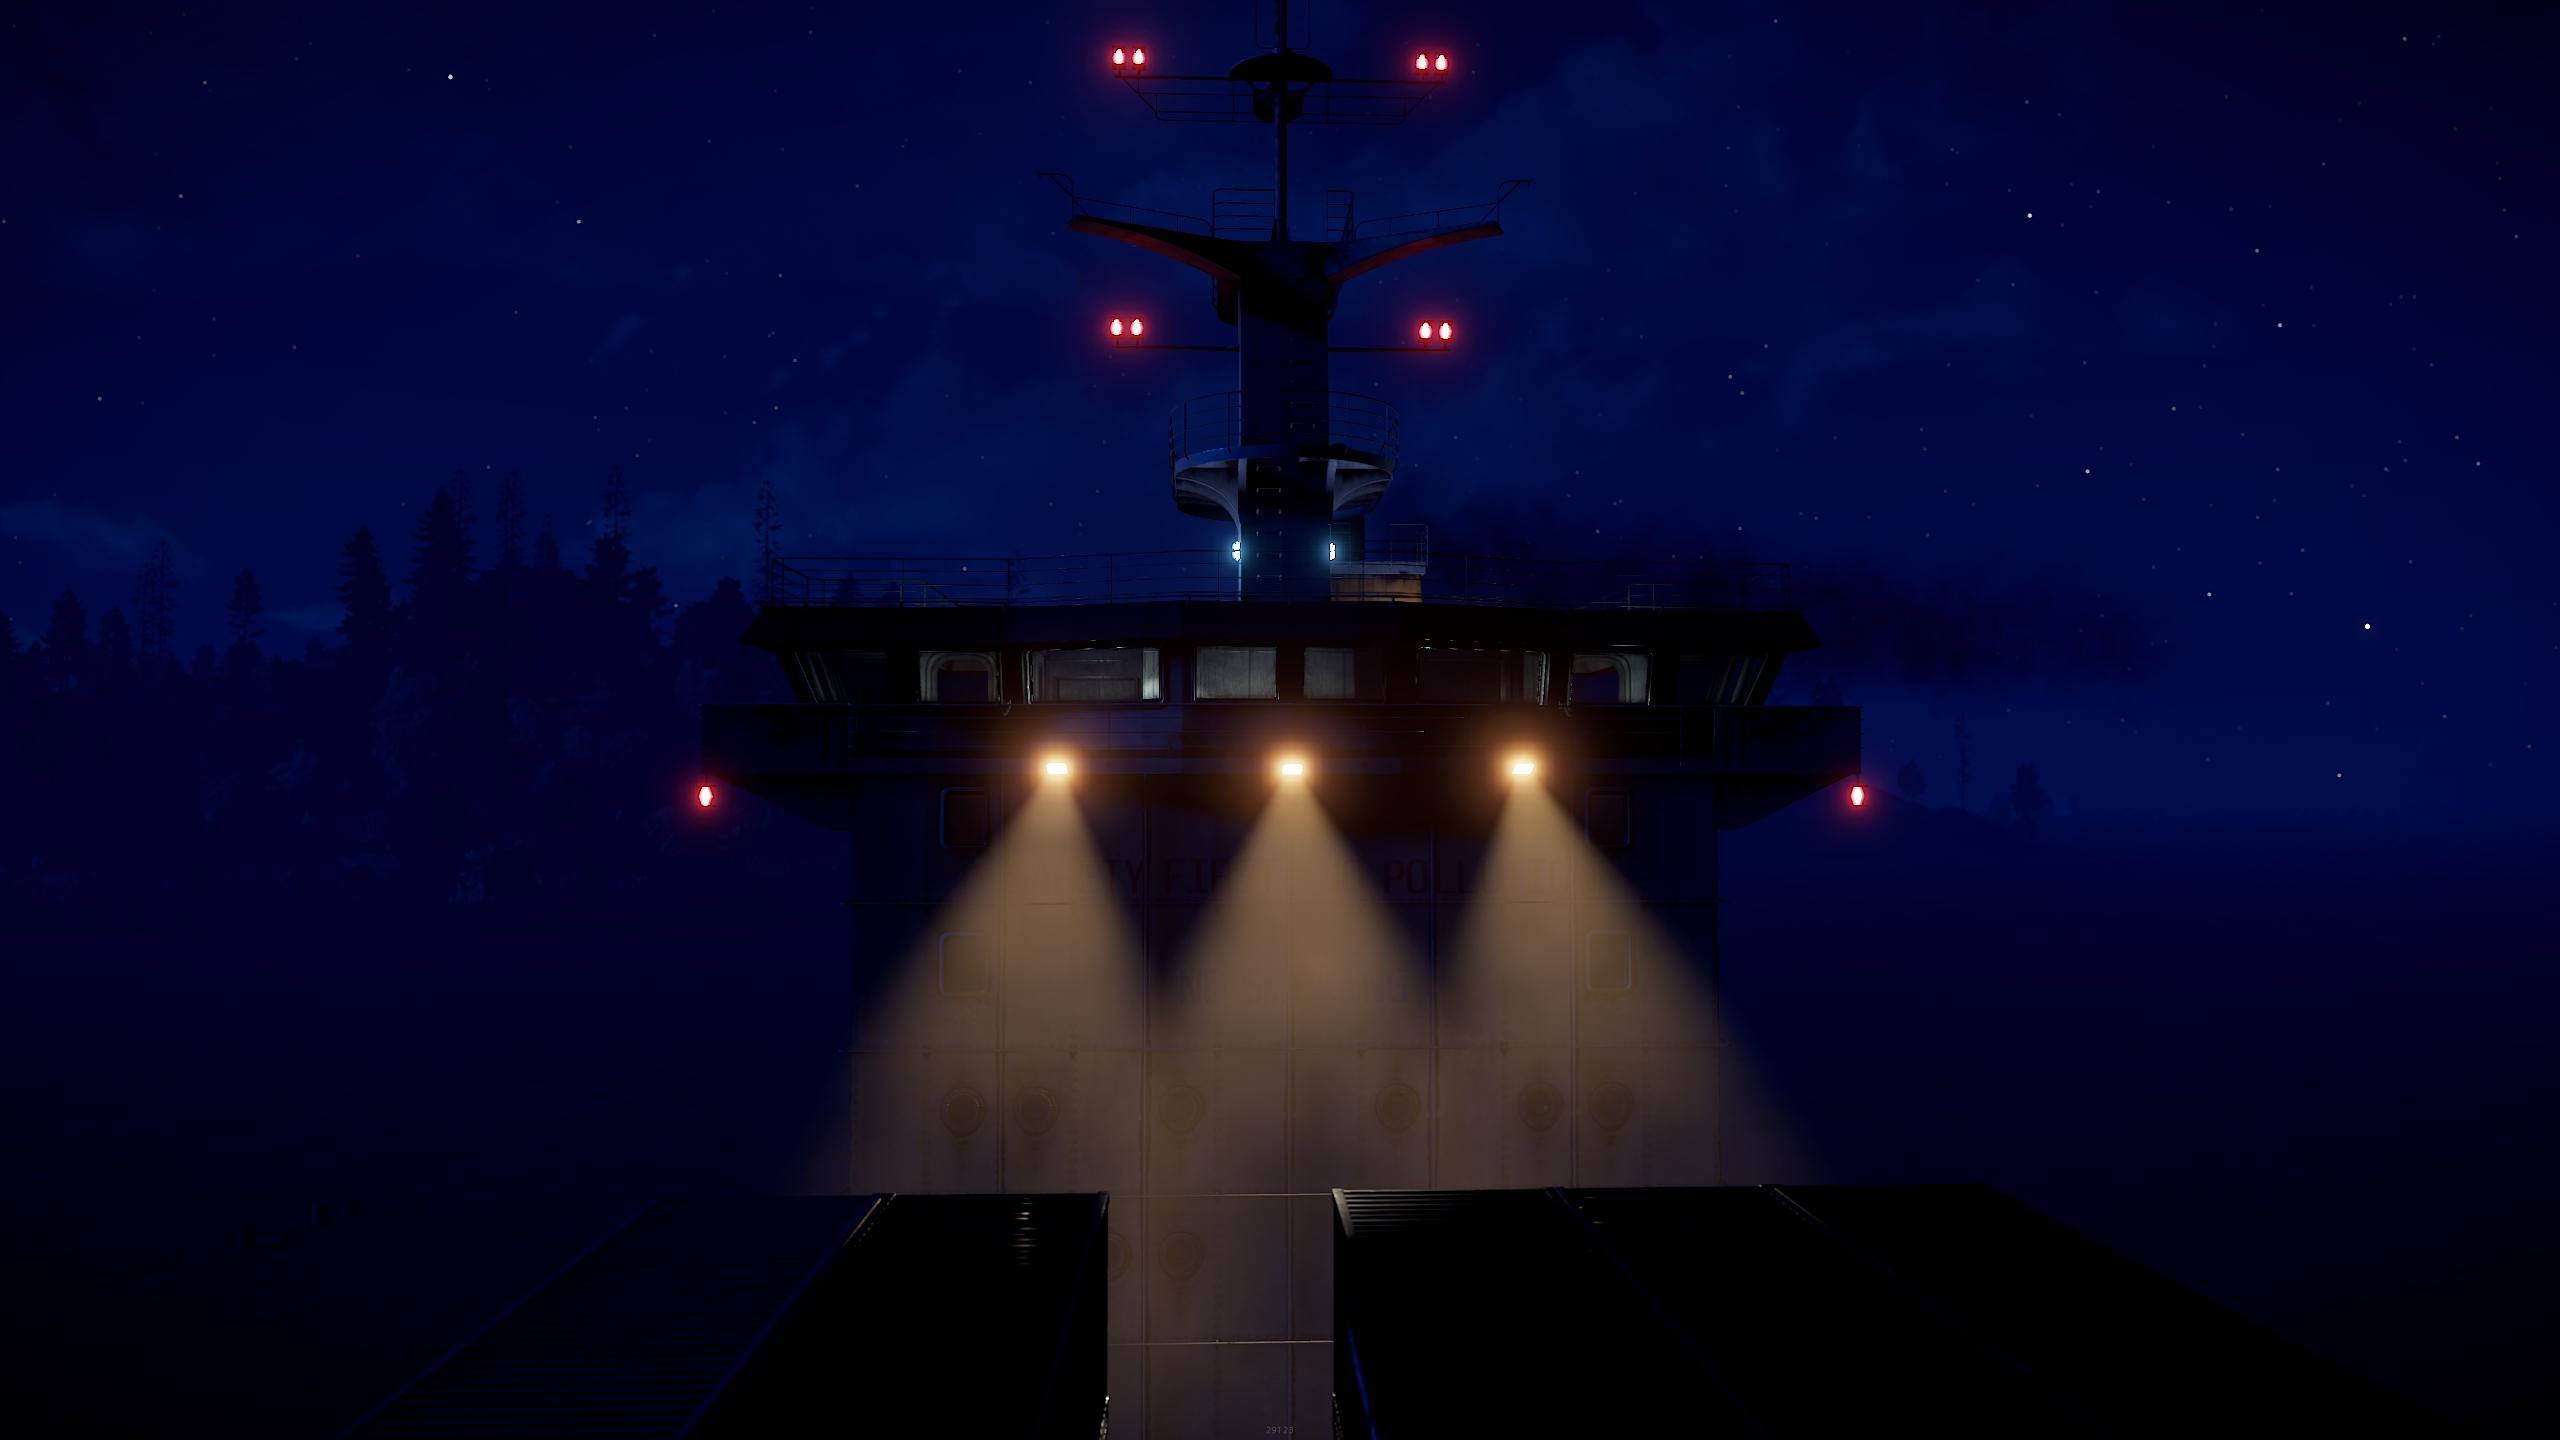 The_Cargo_Ship_Update_8.jpg